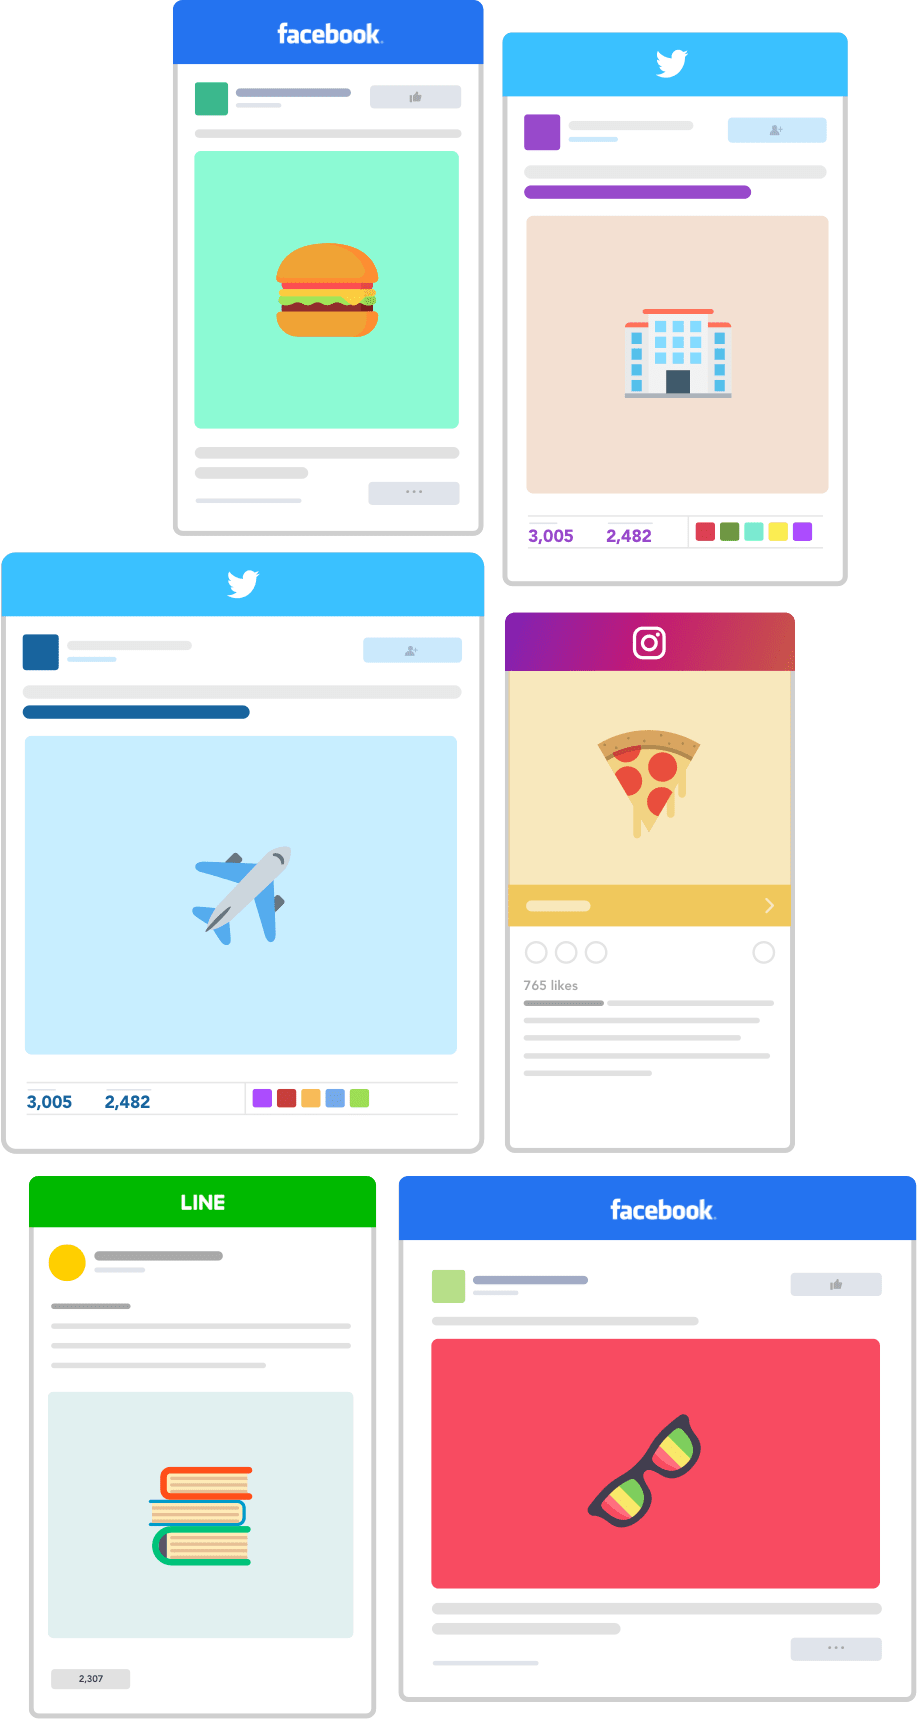 sns-facebook-twitter-instagram-line-flat-design-advertisements